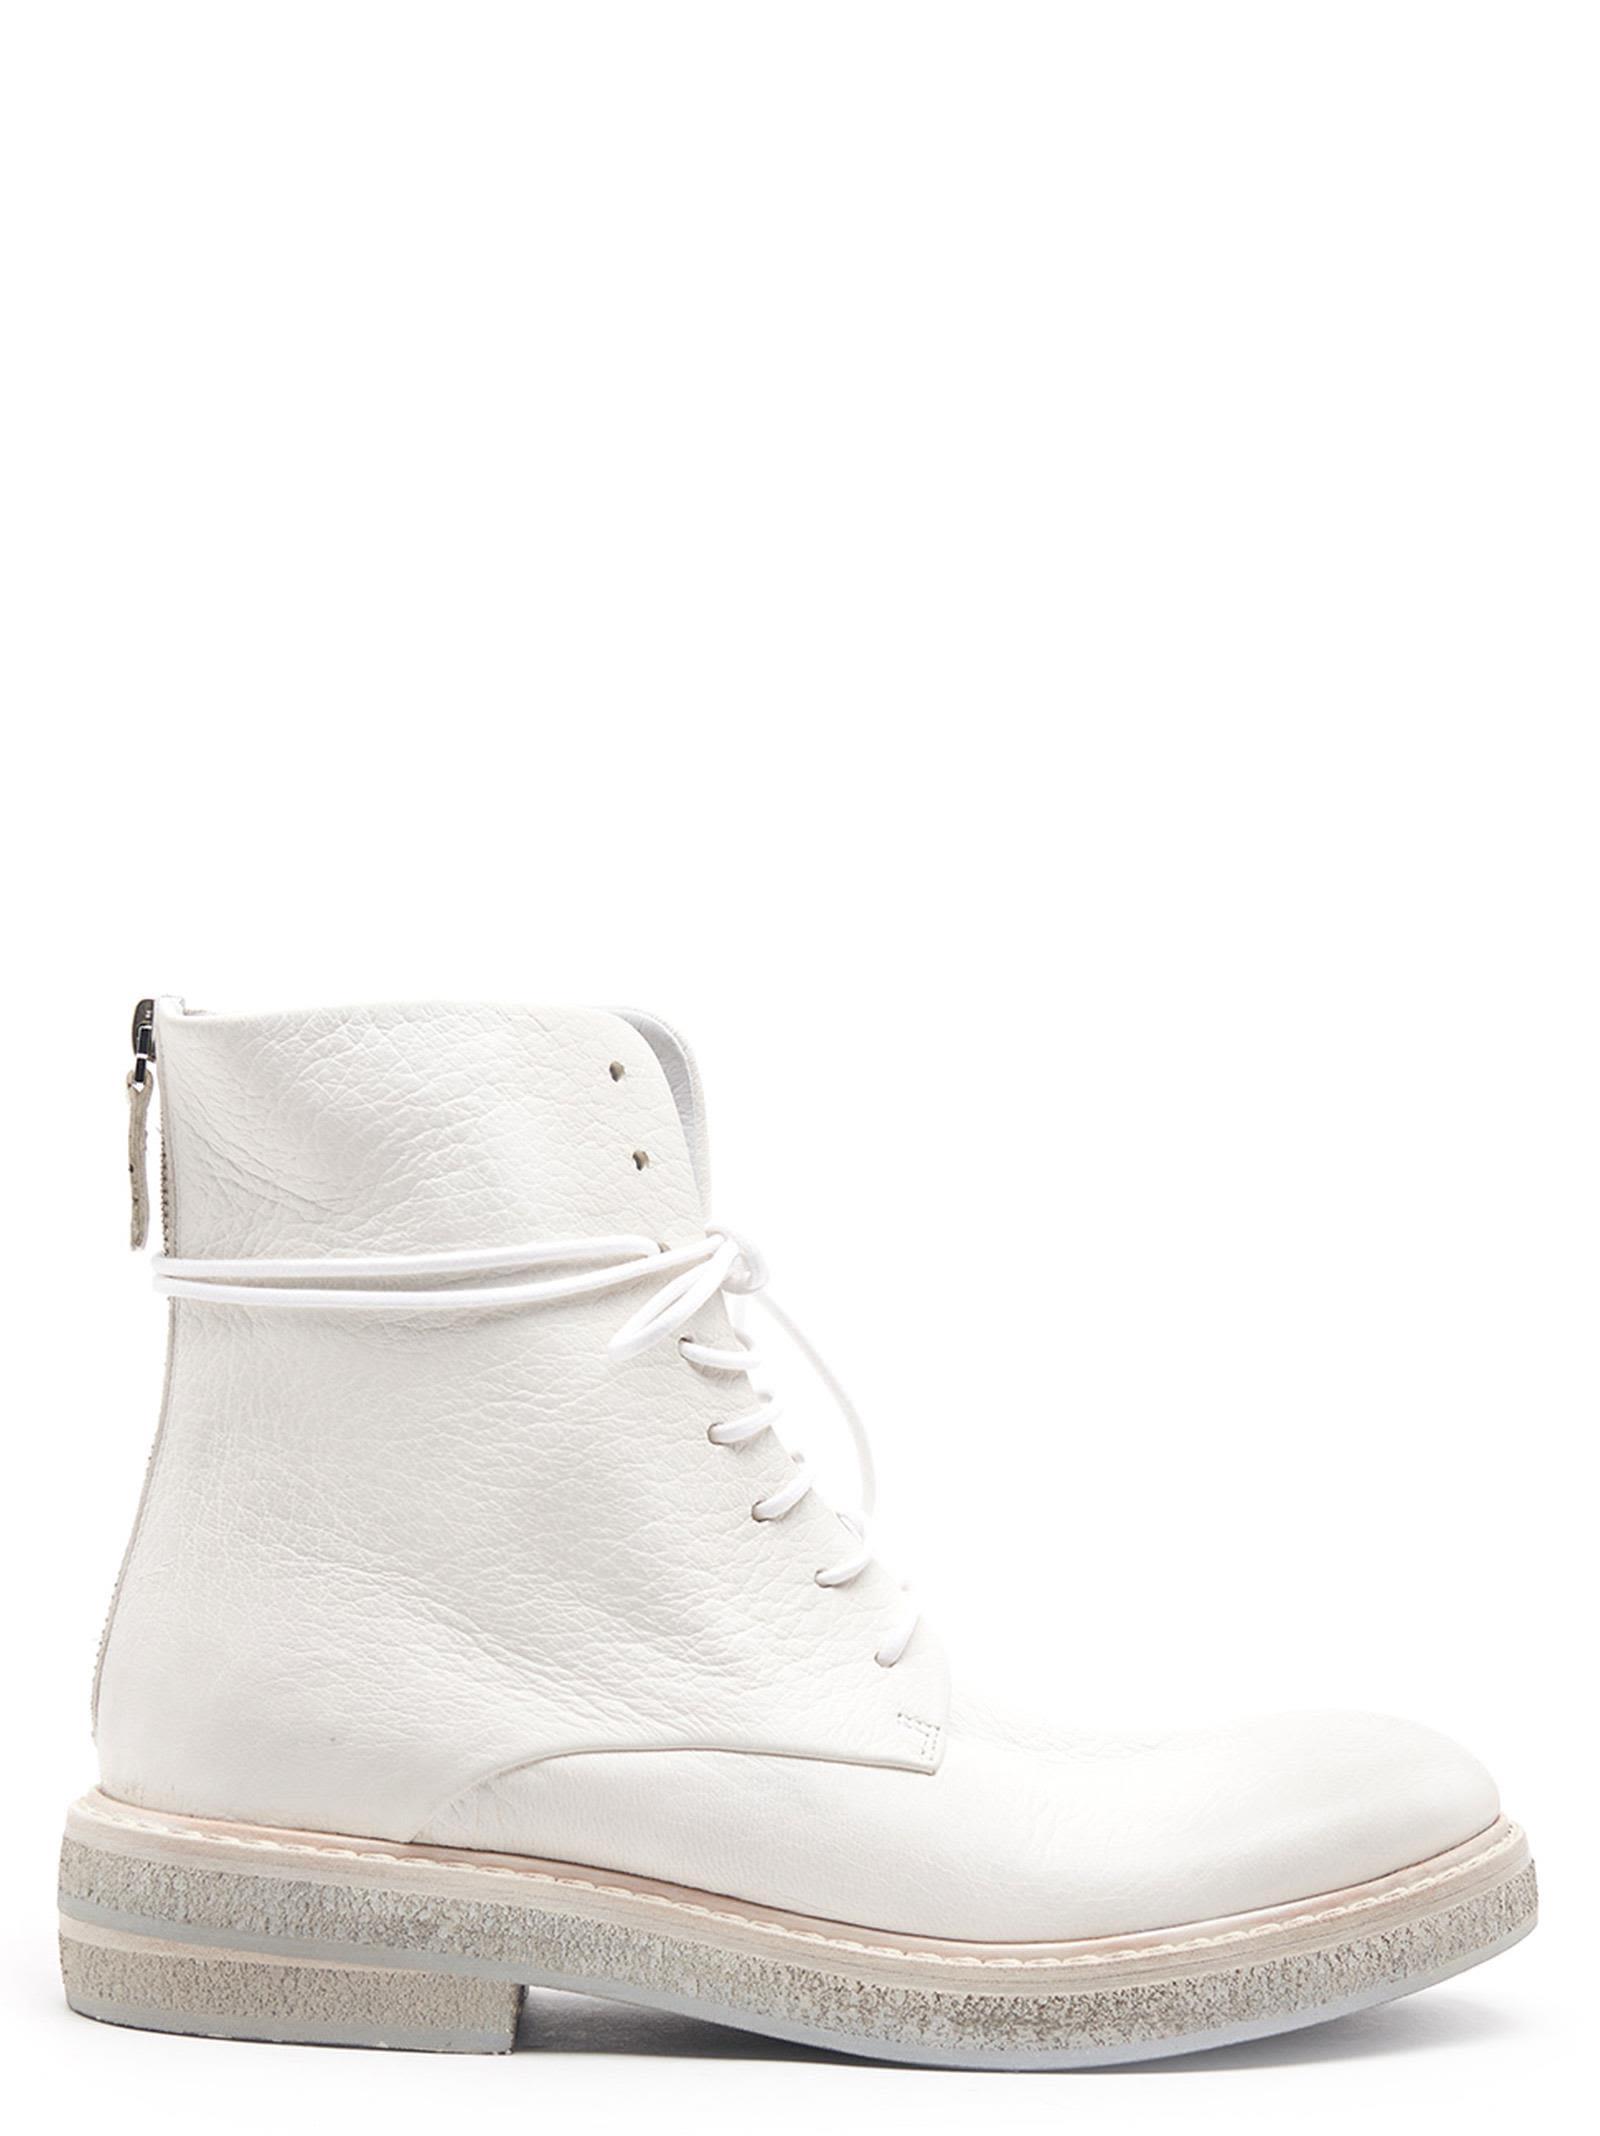 marsell -  'rilisto' Shoes